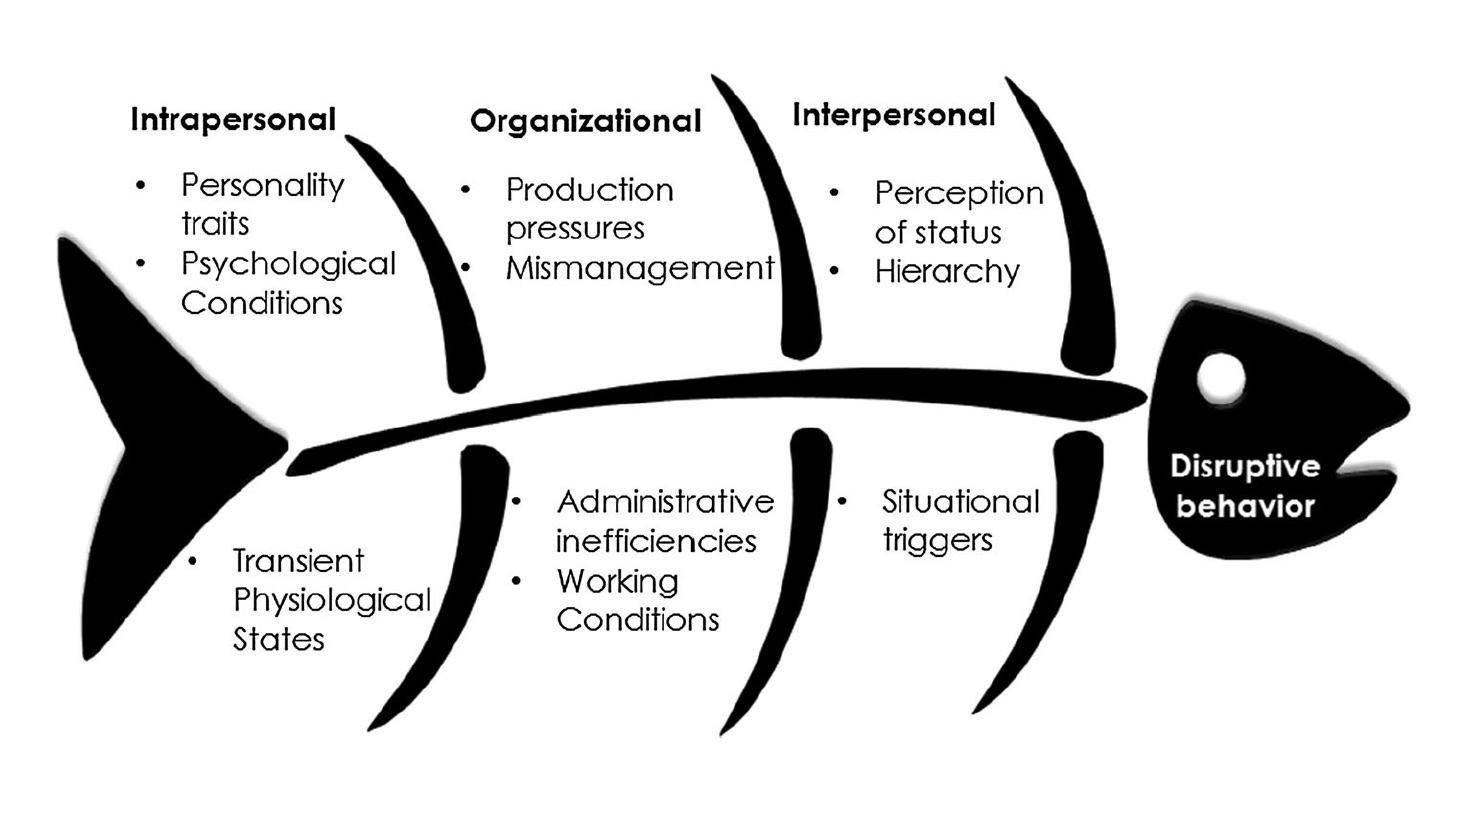 Figure 1: Ishikawa diagram analyzing the antecedent factors guiding disruptive behavior. Image credit to Villafranca et al (2017).